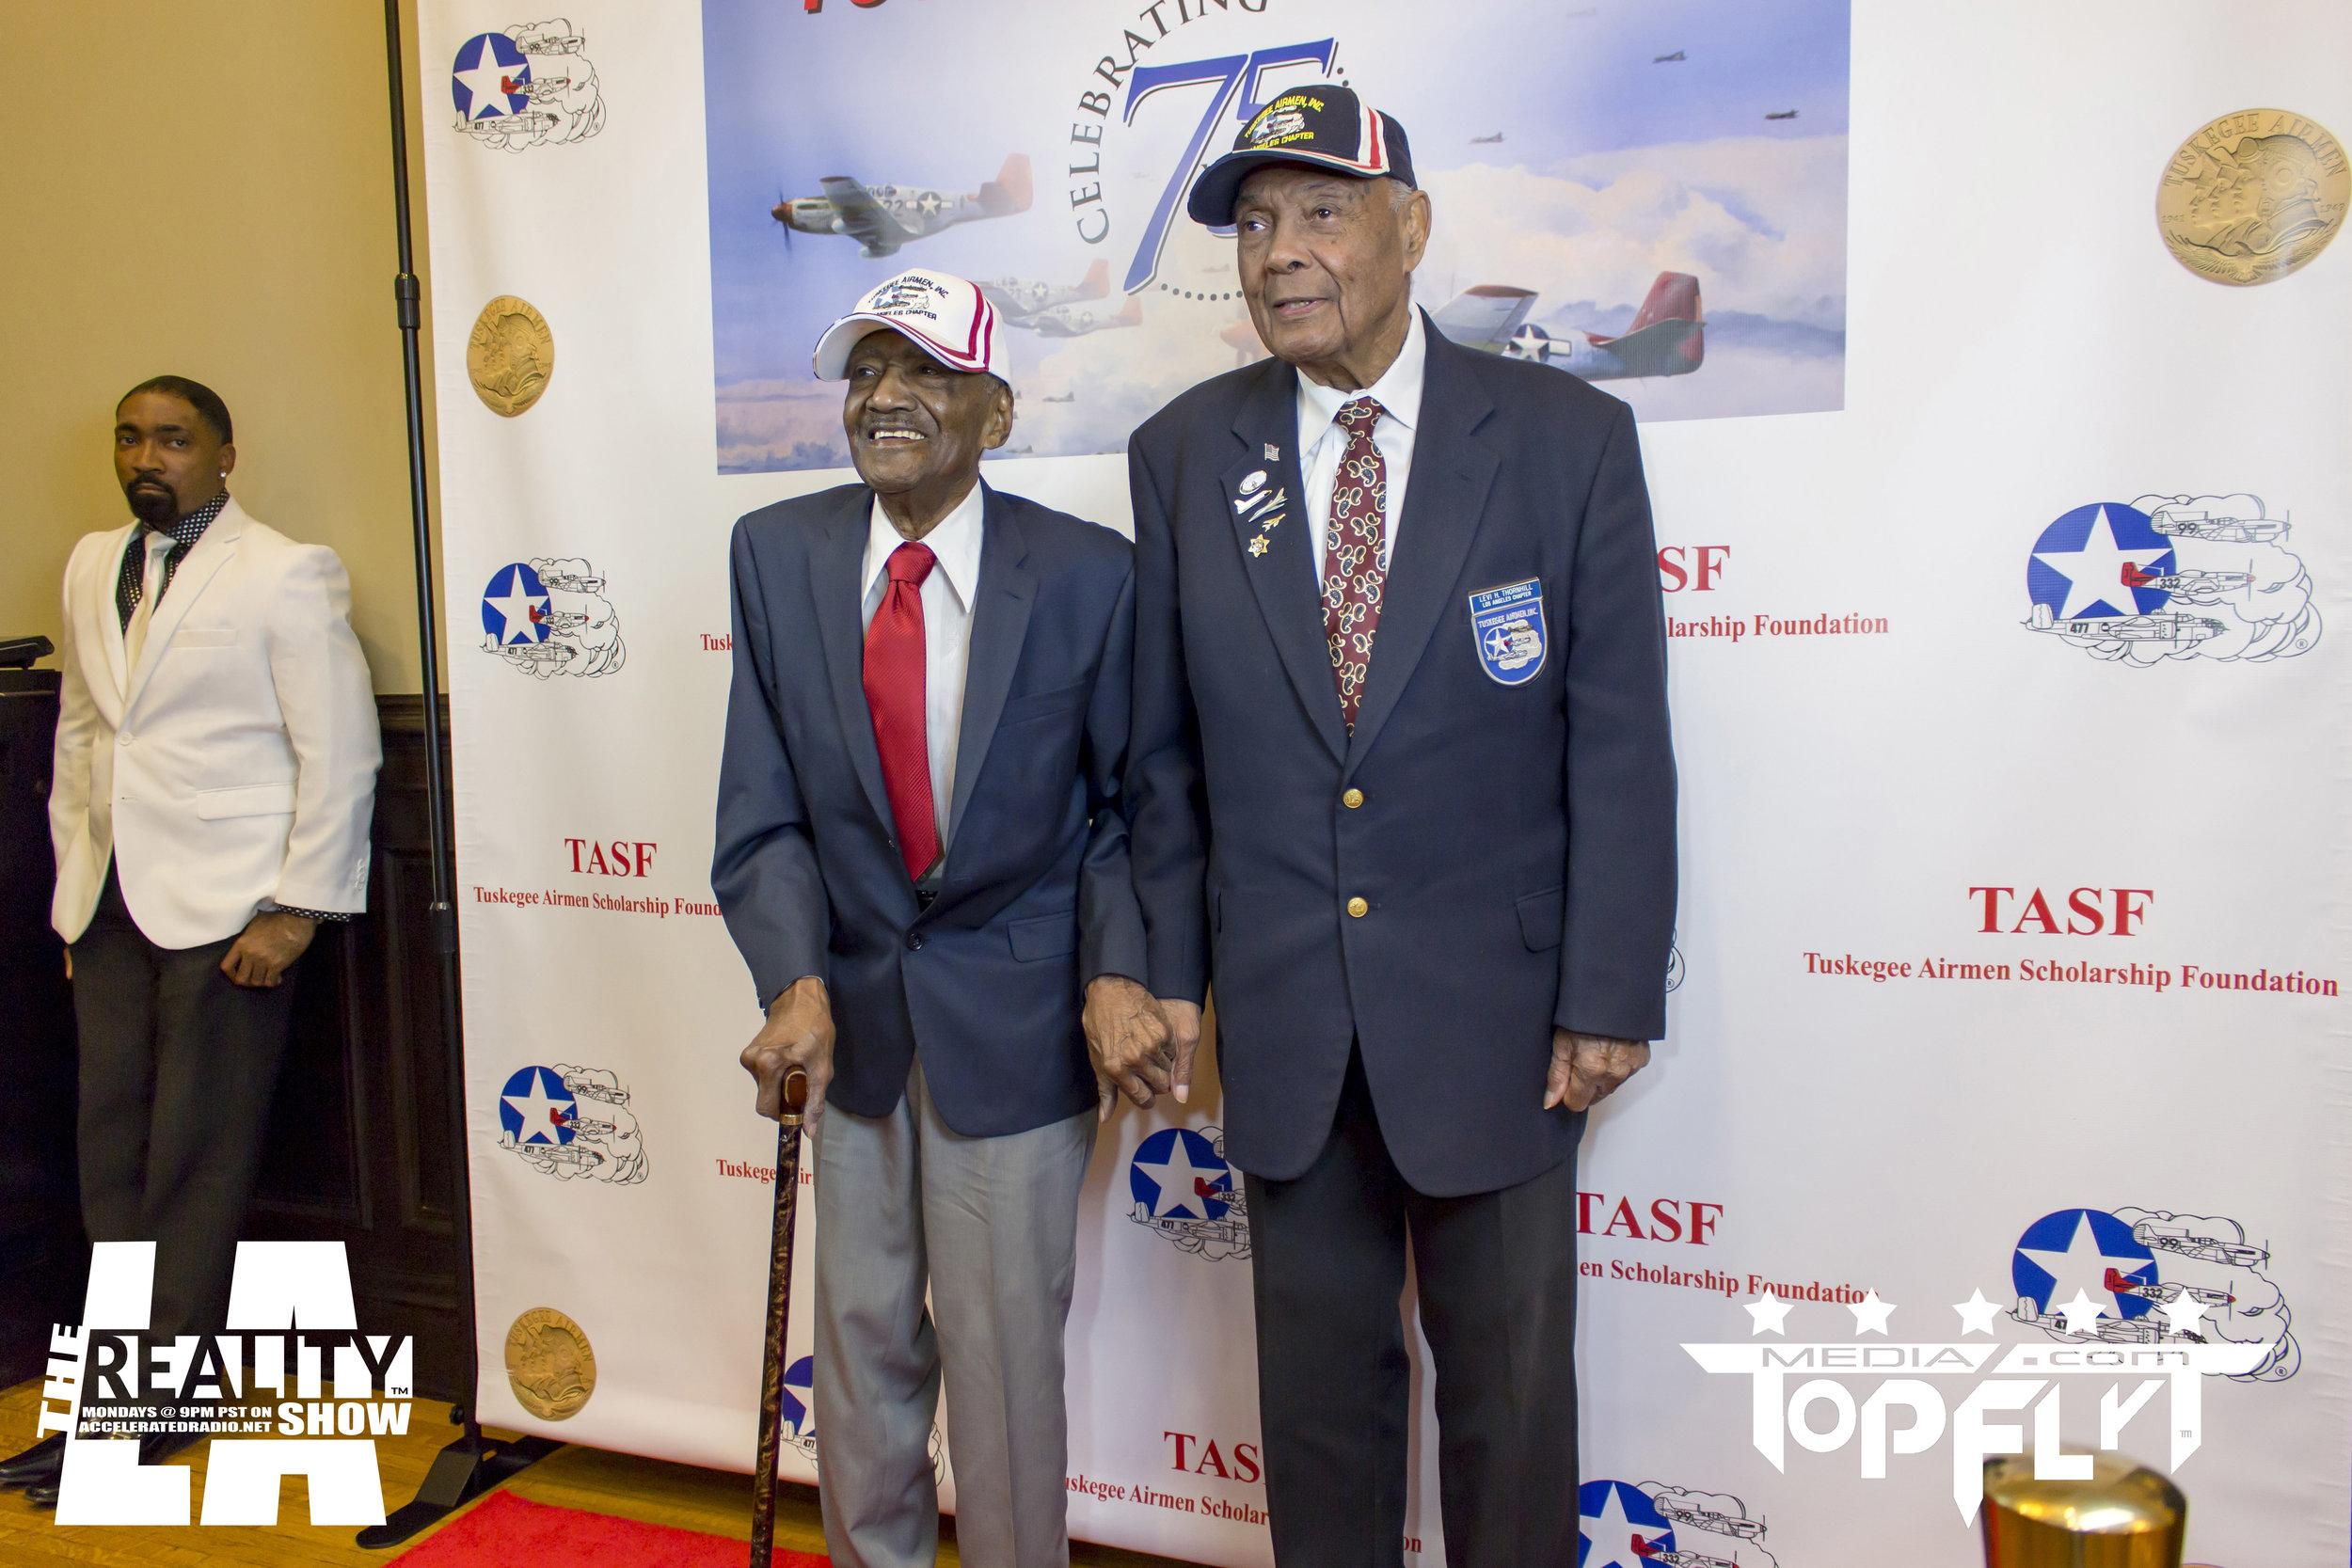 The Reality Show LA - Tuskegee Airmen 75th Anniversary VIP Reception_161.jpg